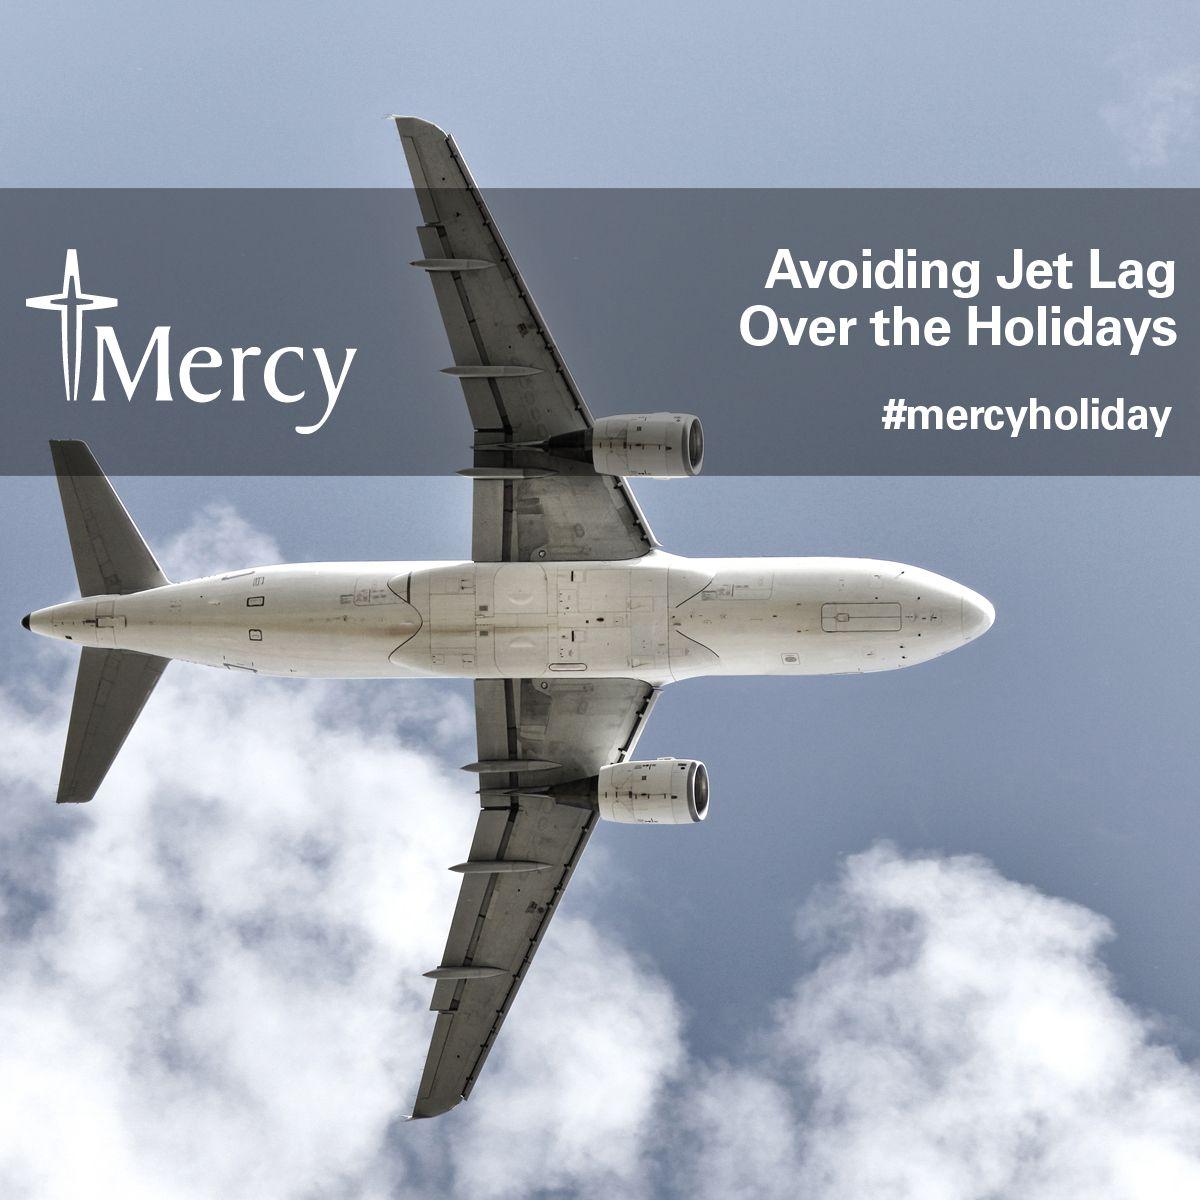 Avoiding Jet Lag - Great tips for Holiday Travel | Mercy Medical Center - Des Moines